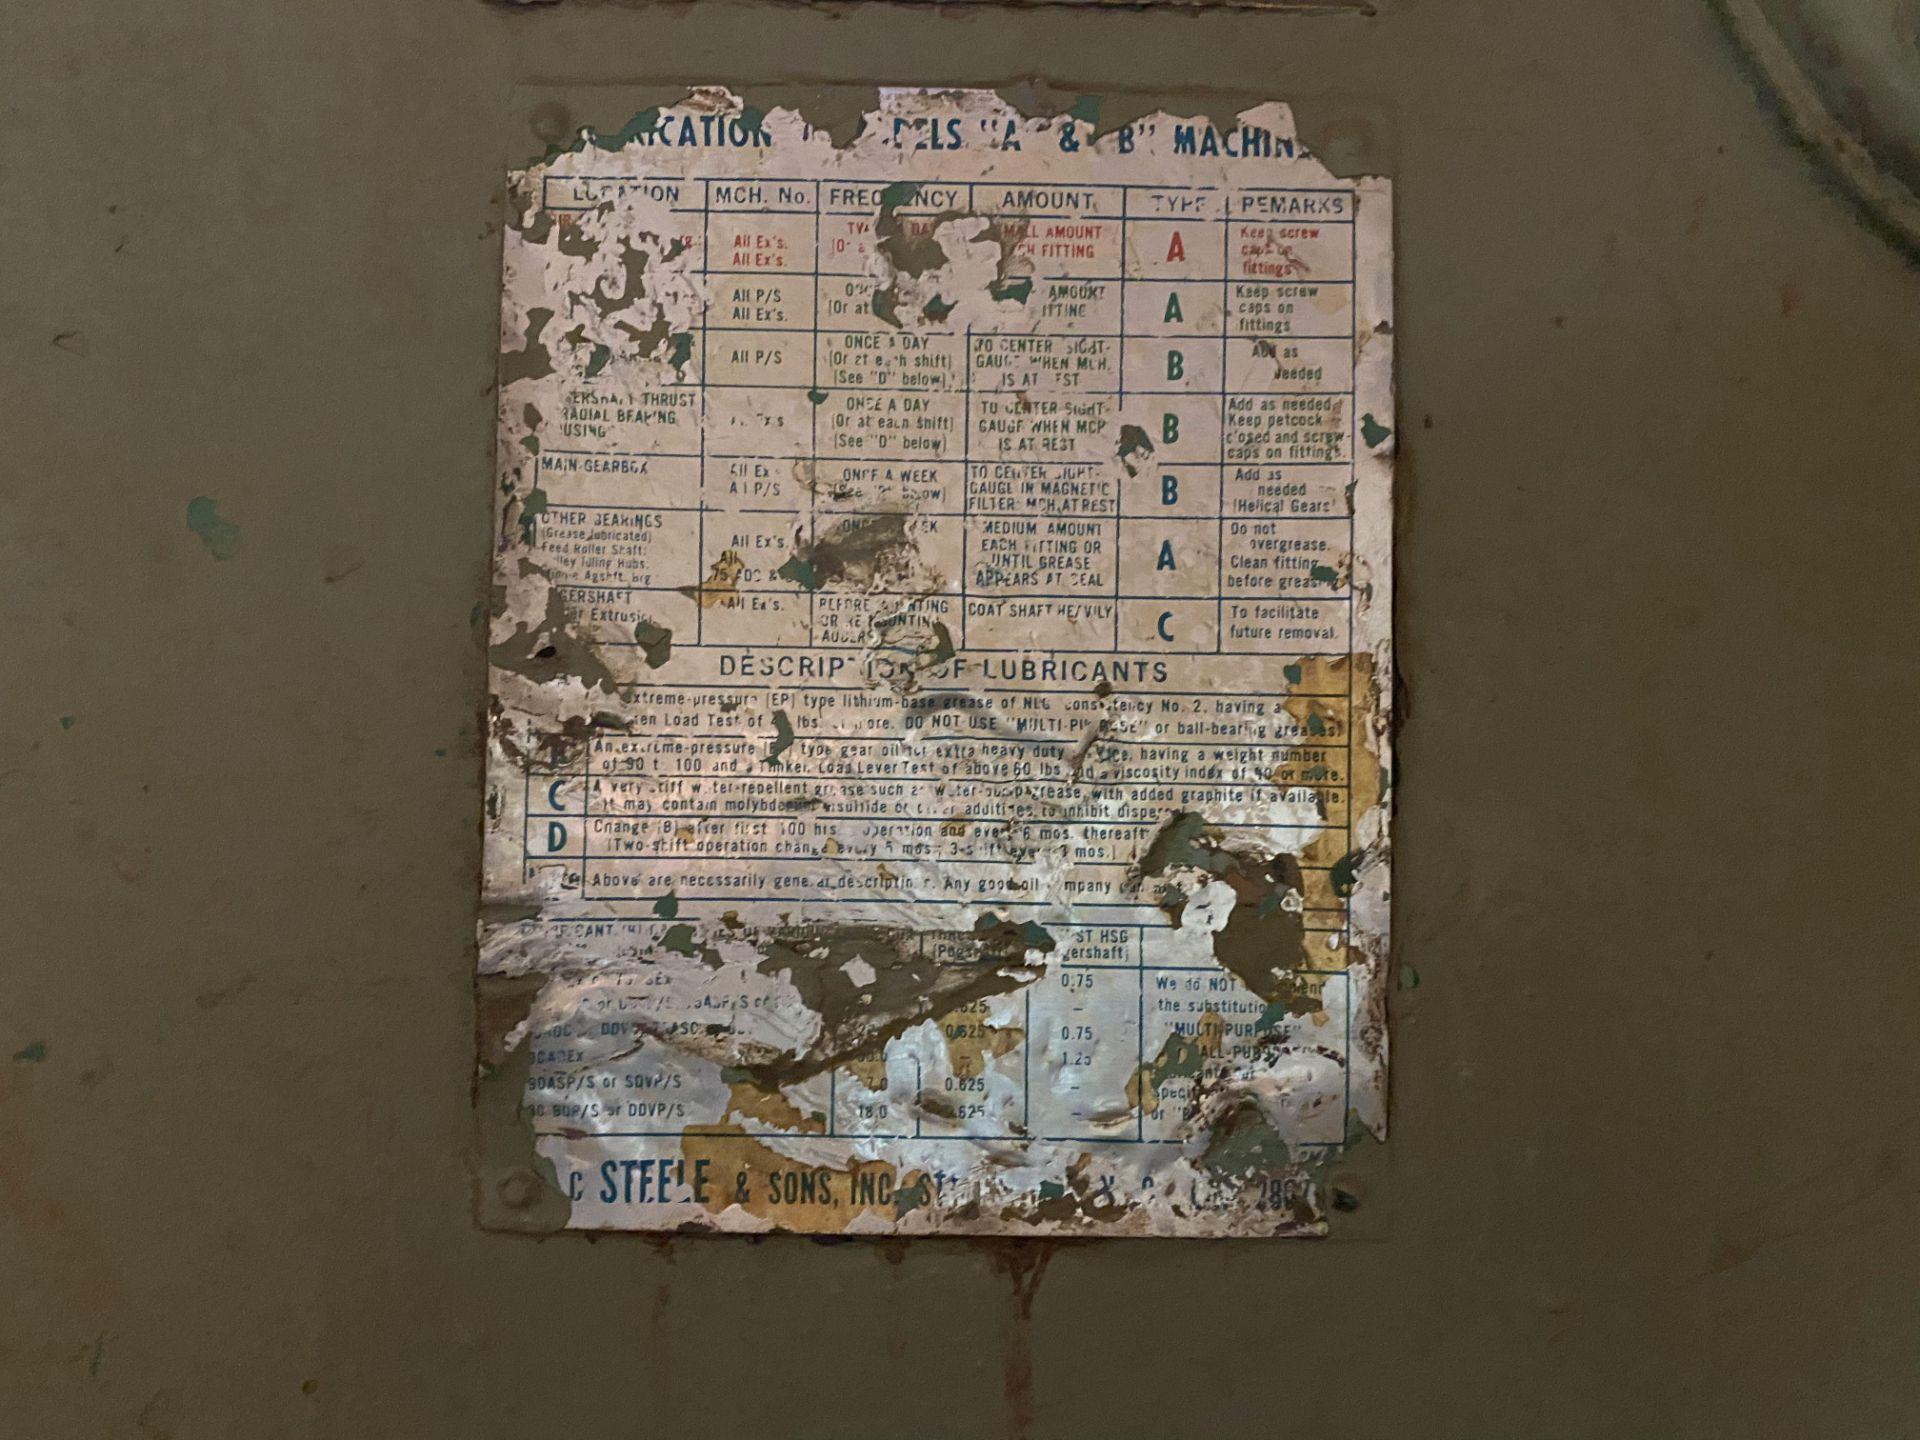 HAZEMAG IMPACT CRUSHER, MODEL 1315, 60'' DIAMETER ROTOR, 60'' WIDE, 575V, 450 HP - Image 13 of 25